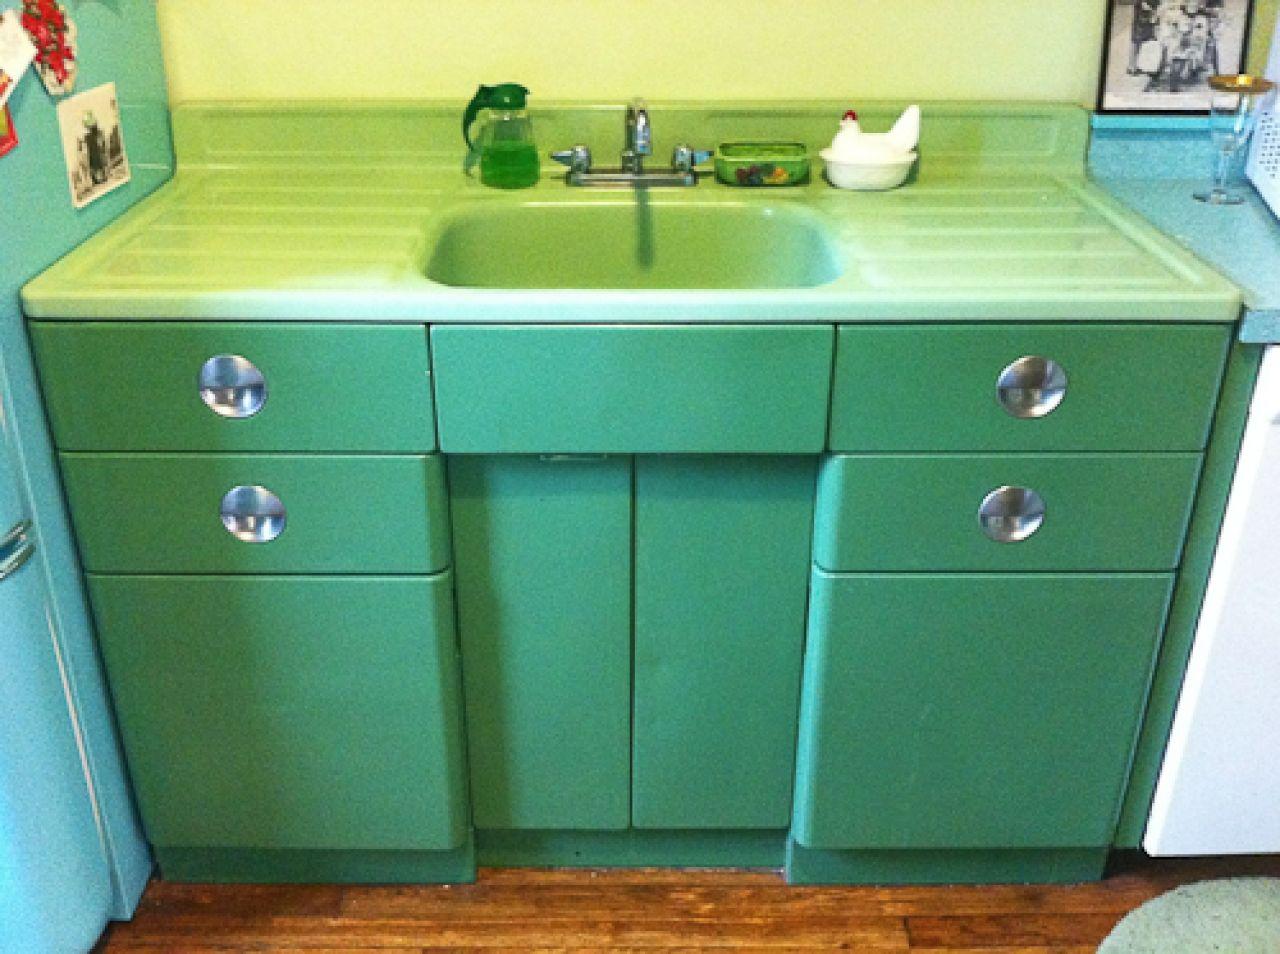 kitchen sink cabinets Vintage Metal Kitchen Cabinet Vintage jadeite porcelain drainboard sink and metal sink cabinet